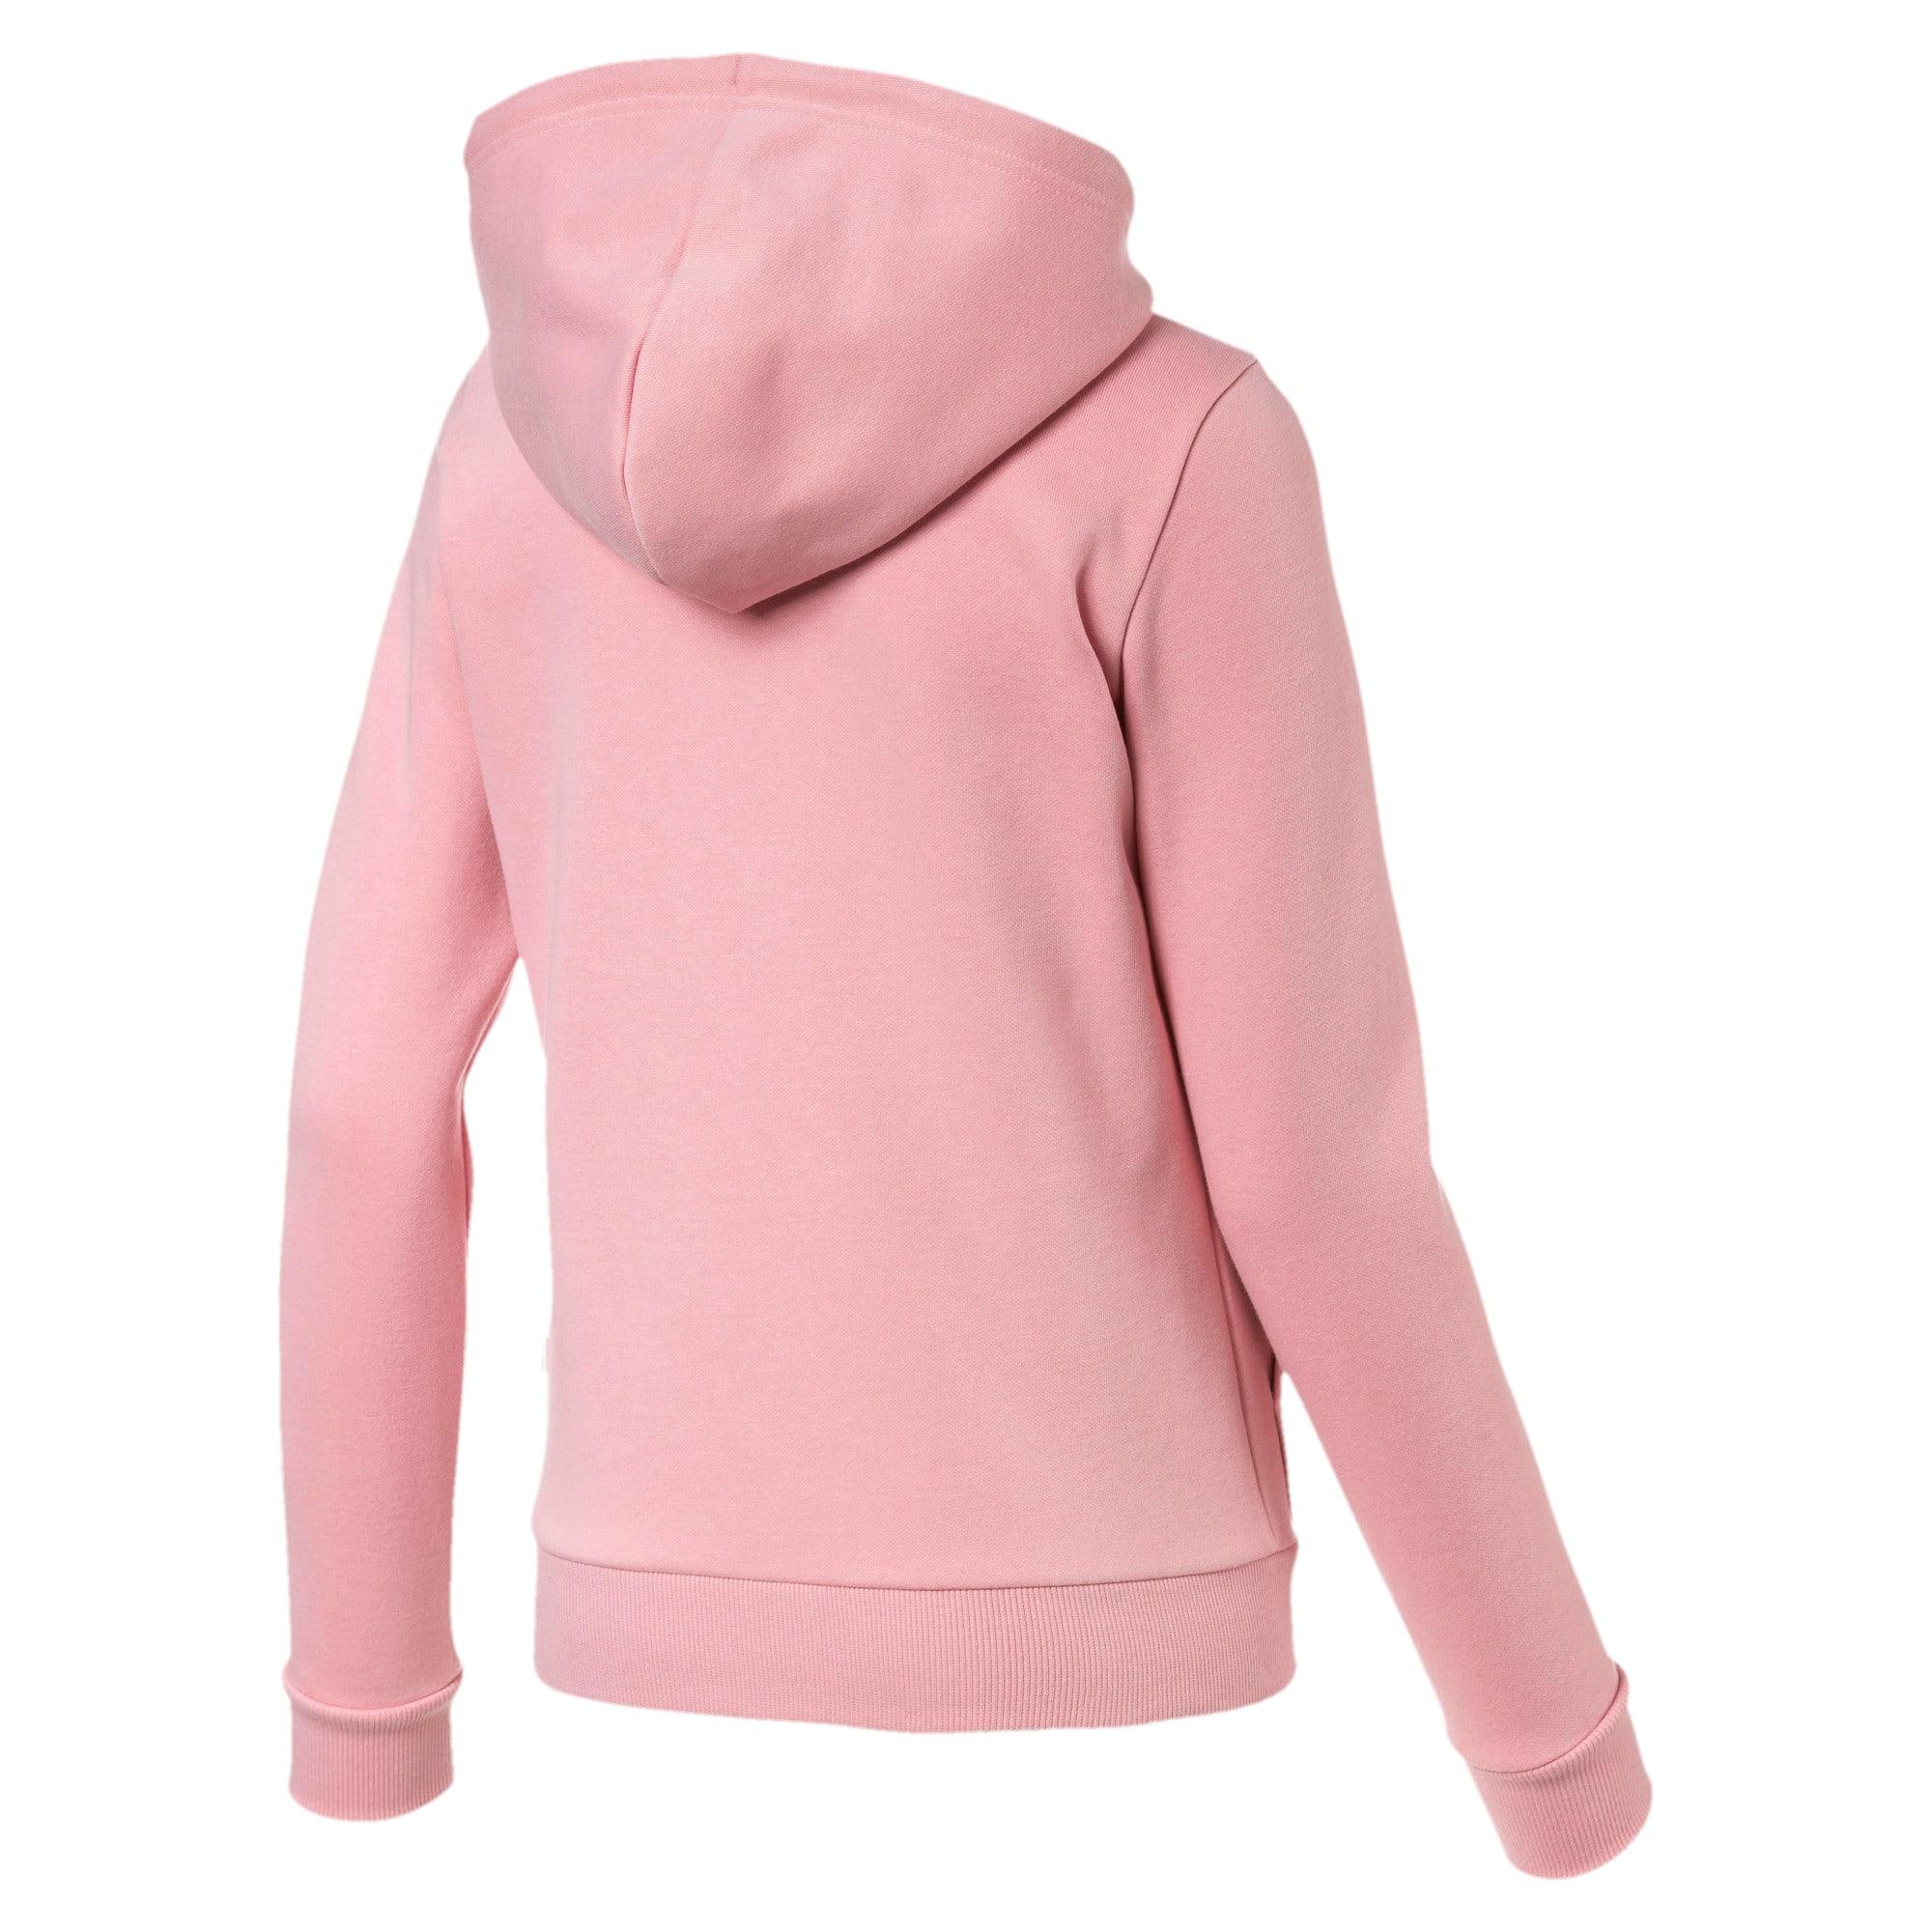 Thumbnail 5 of Essentials Women's Hooded Fleece Jacket, Bridal Rose, medium